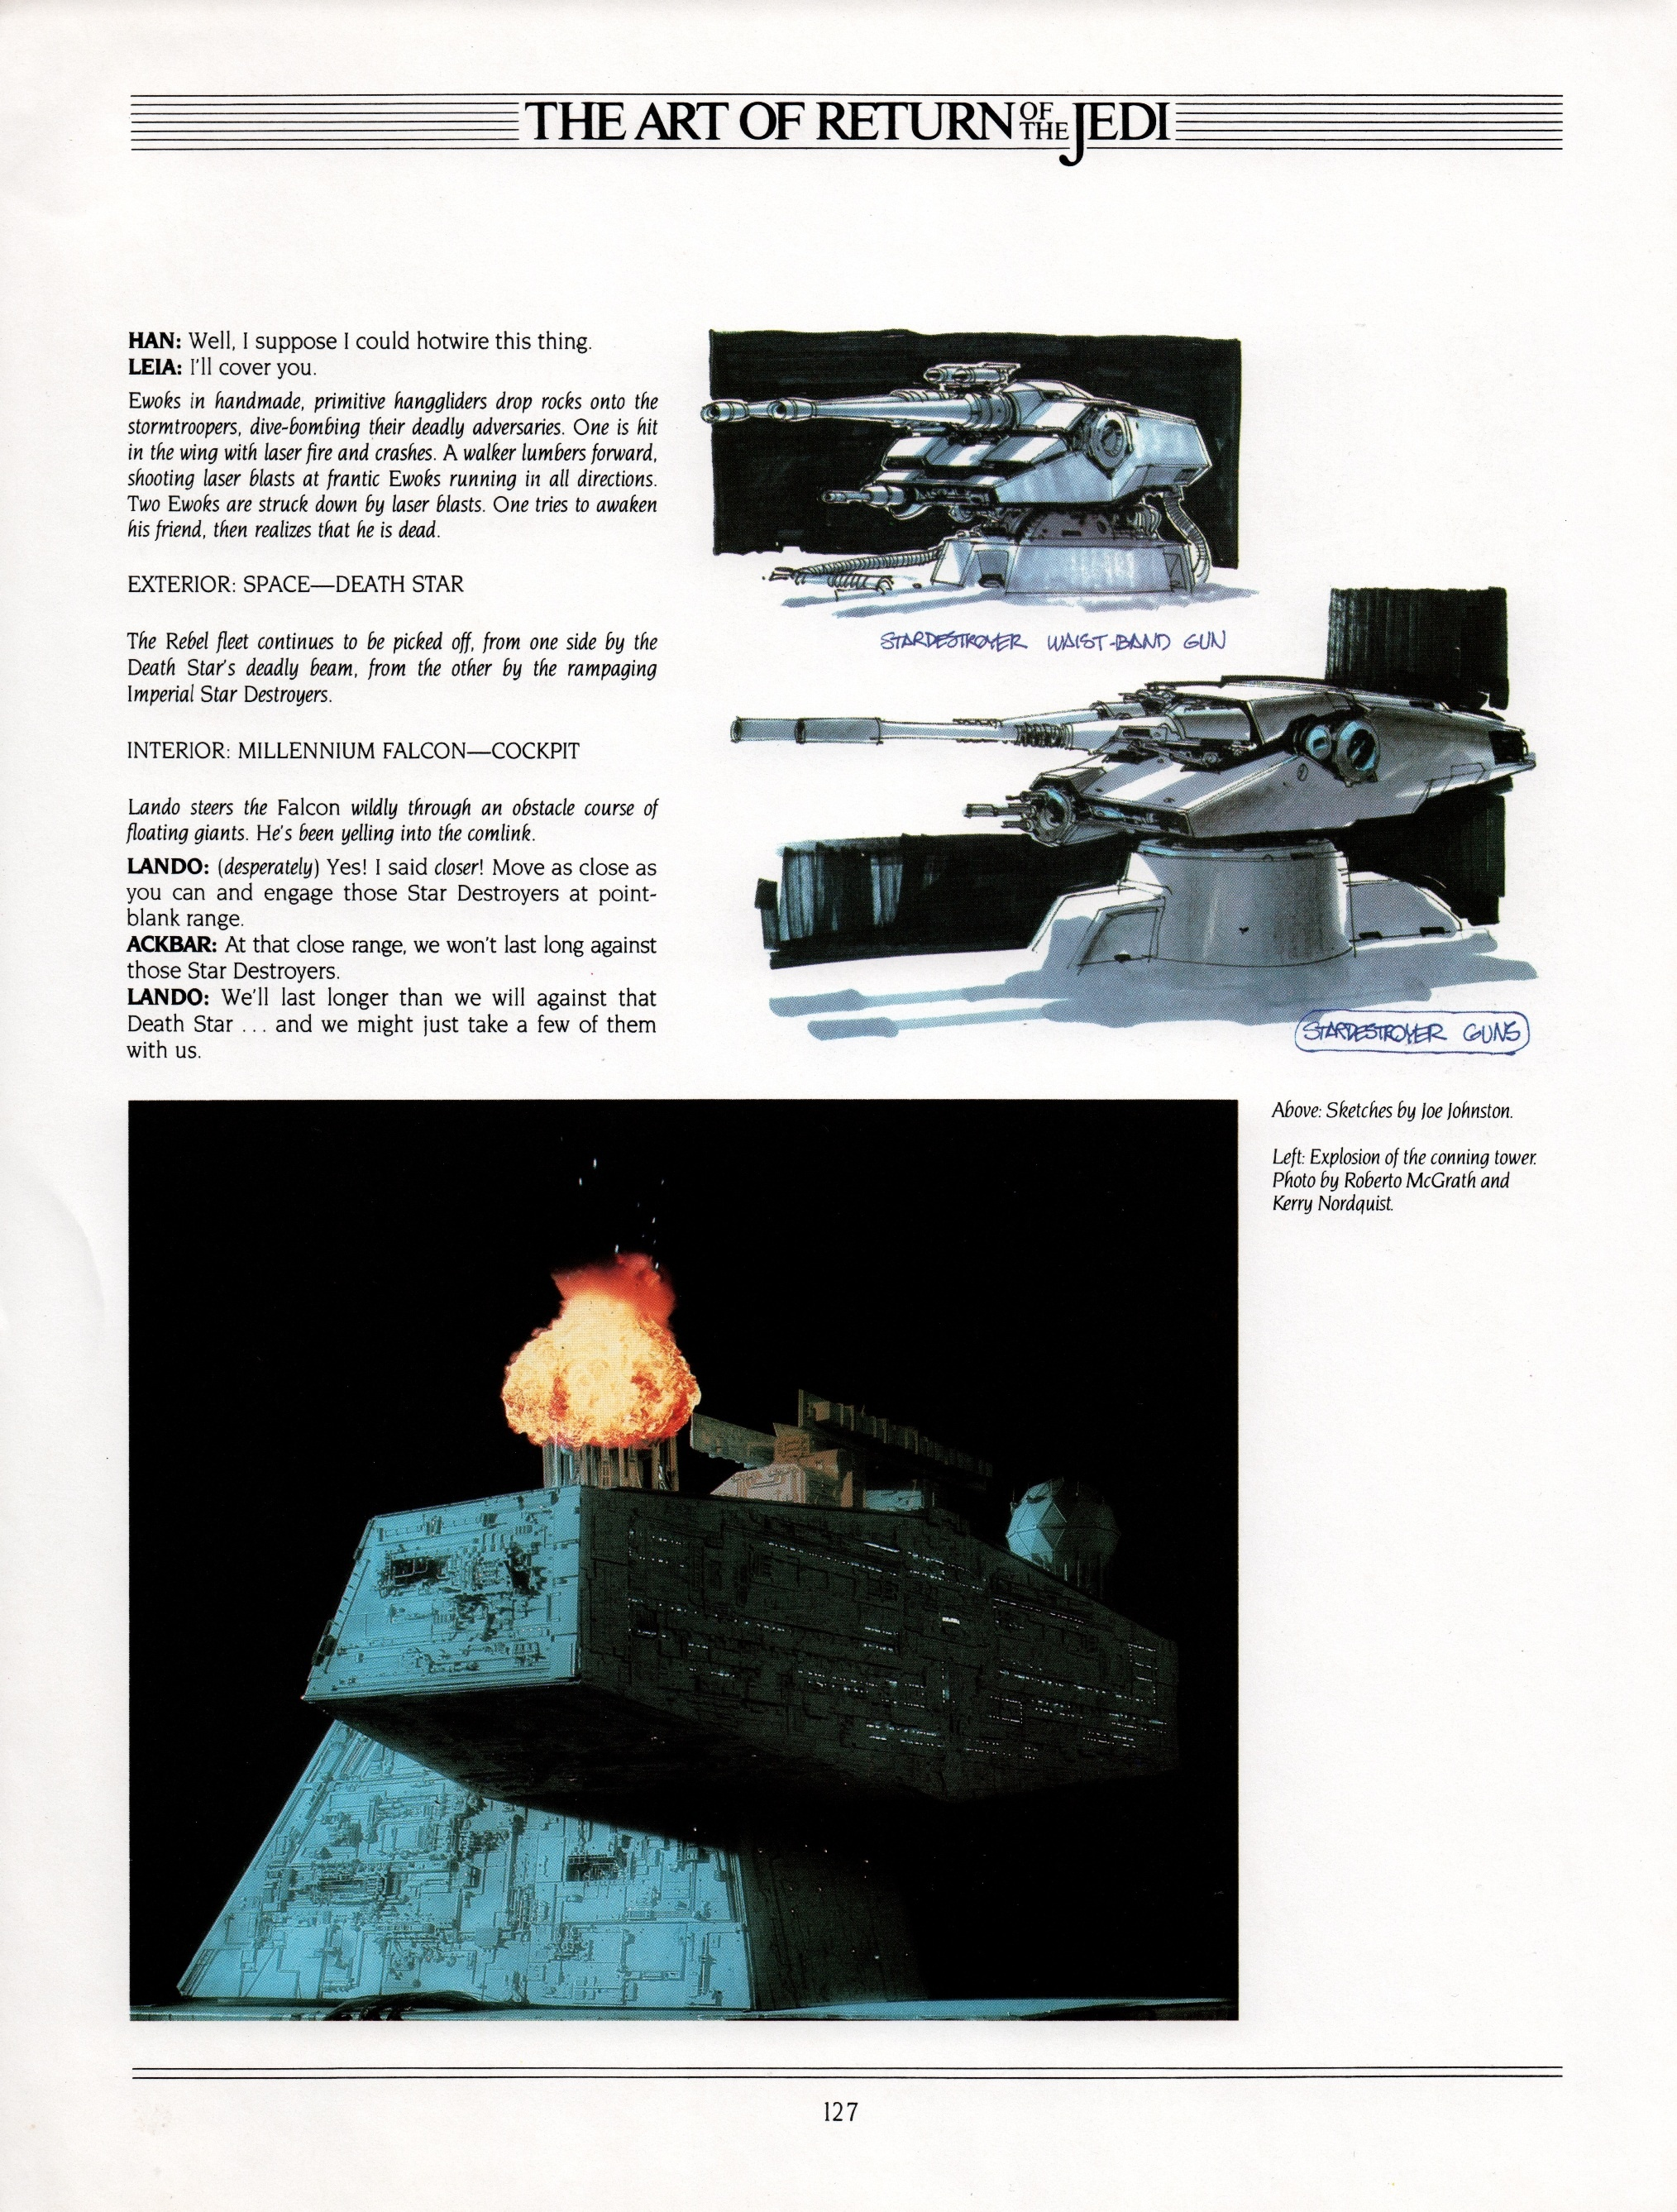 Art of Return of the Jedi (b0bafett_Empire)-p127